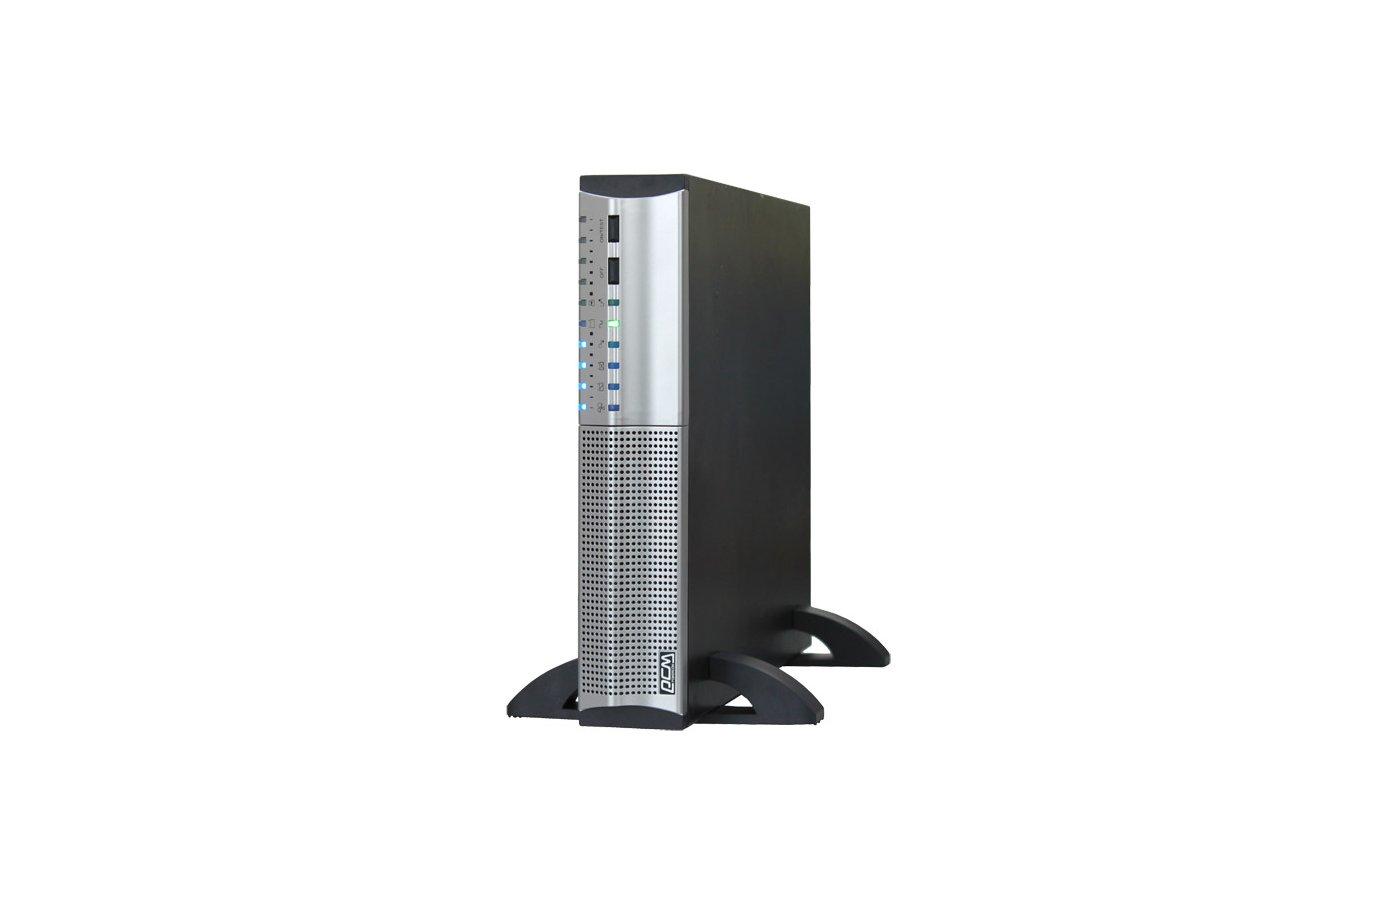 Блок питания Powercom Smart King RT SRT-2000A 1800Вт 2000ВА черный